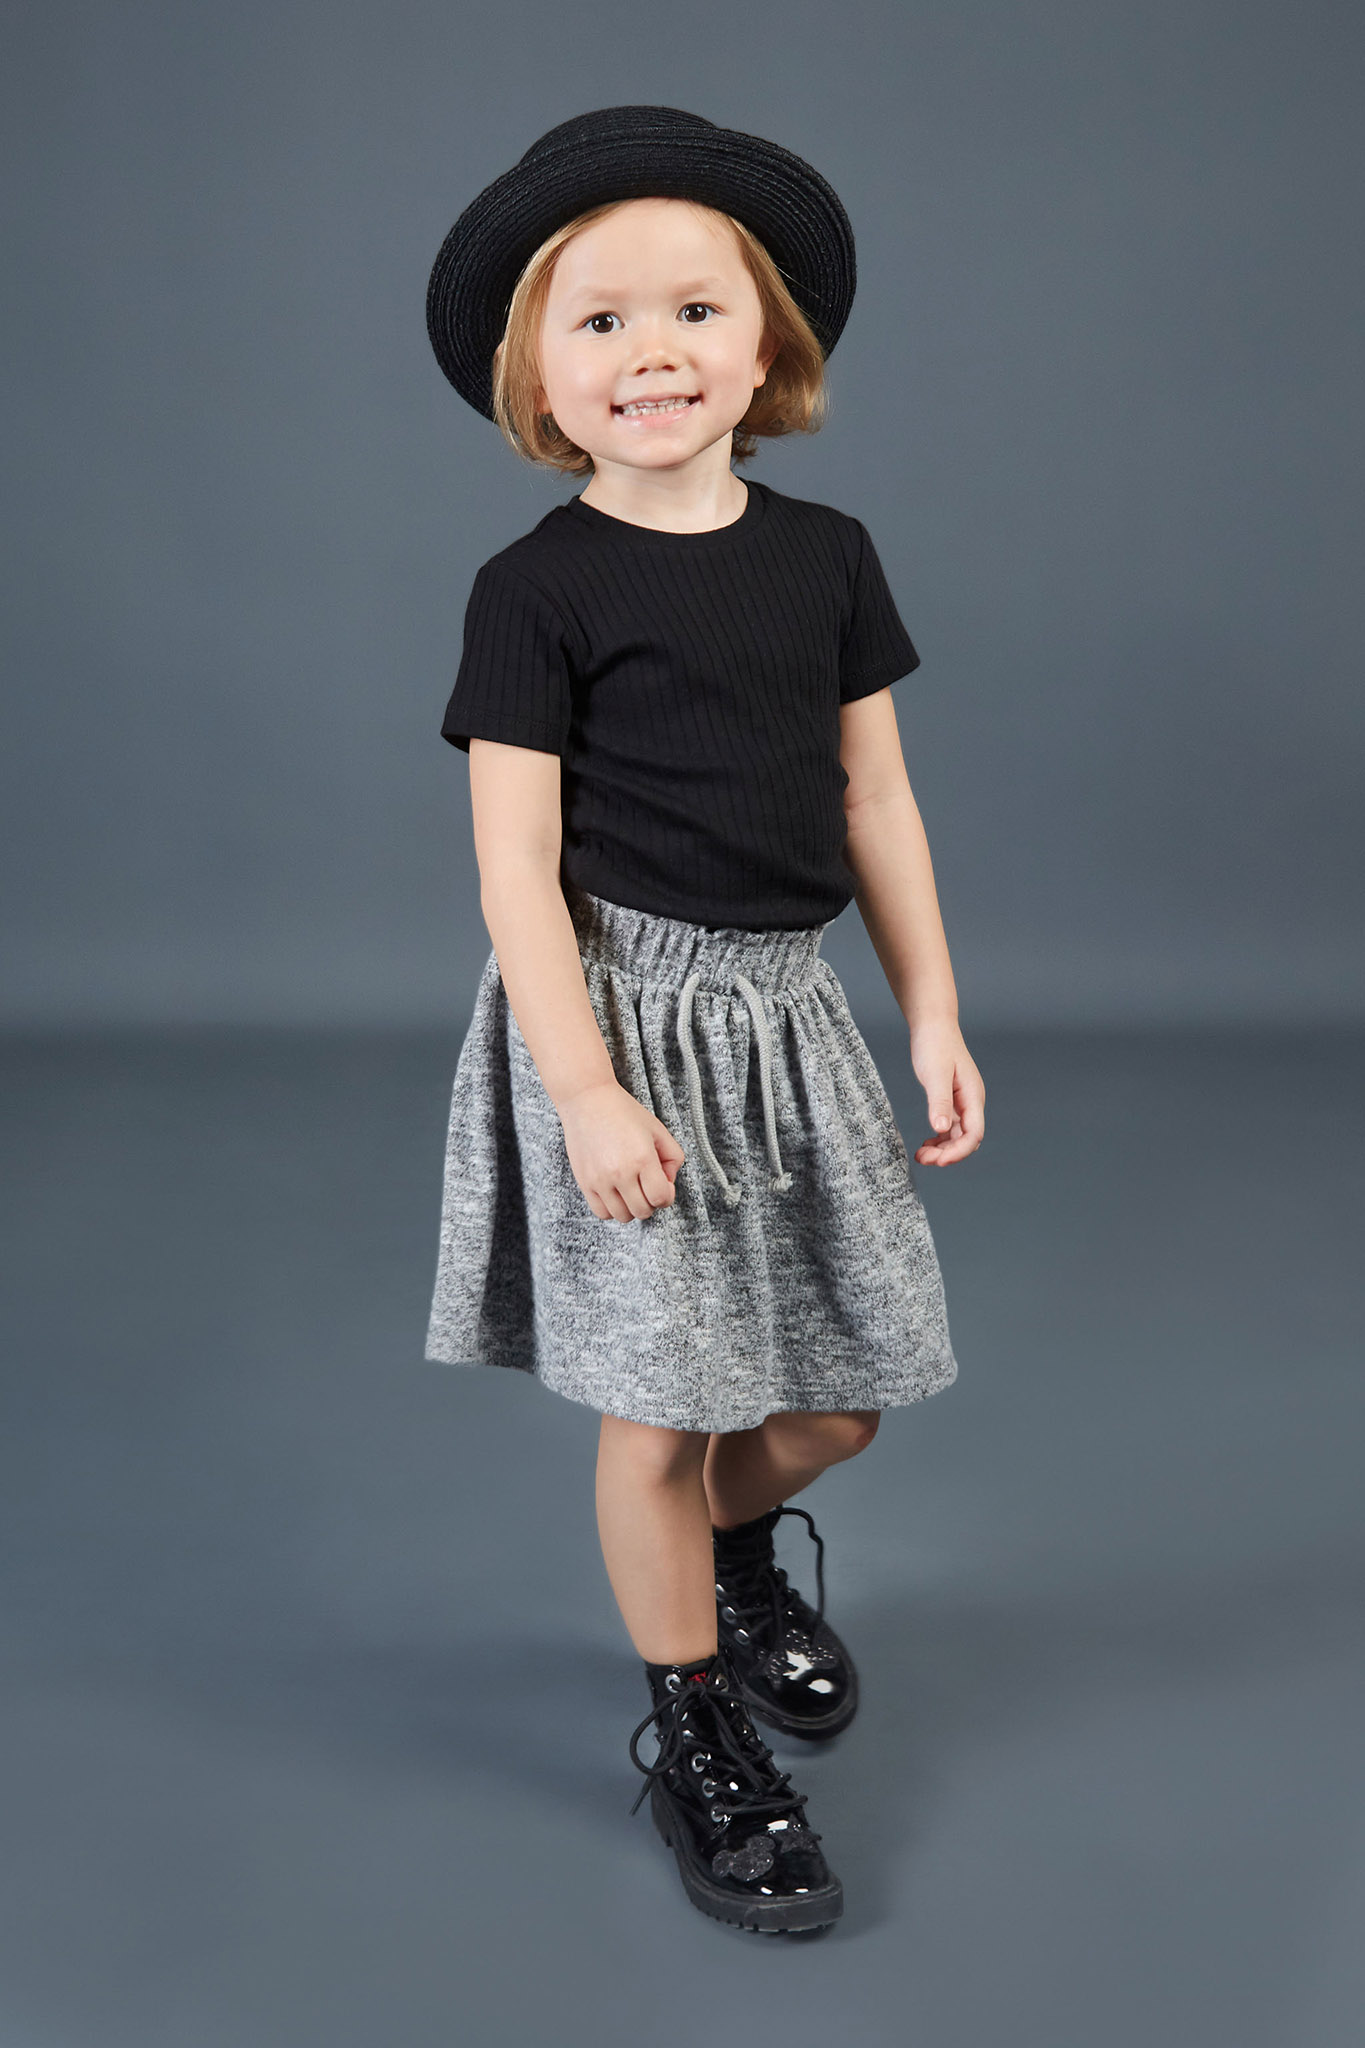 kids-catalog-photography-the-jersey-shop-7